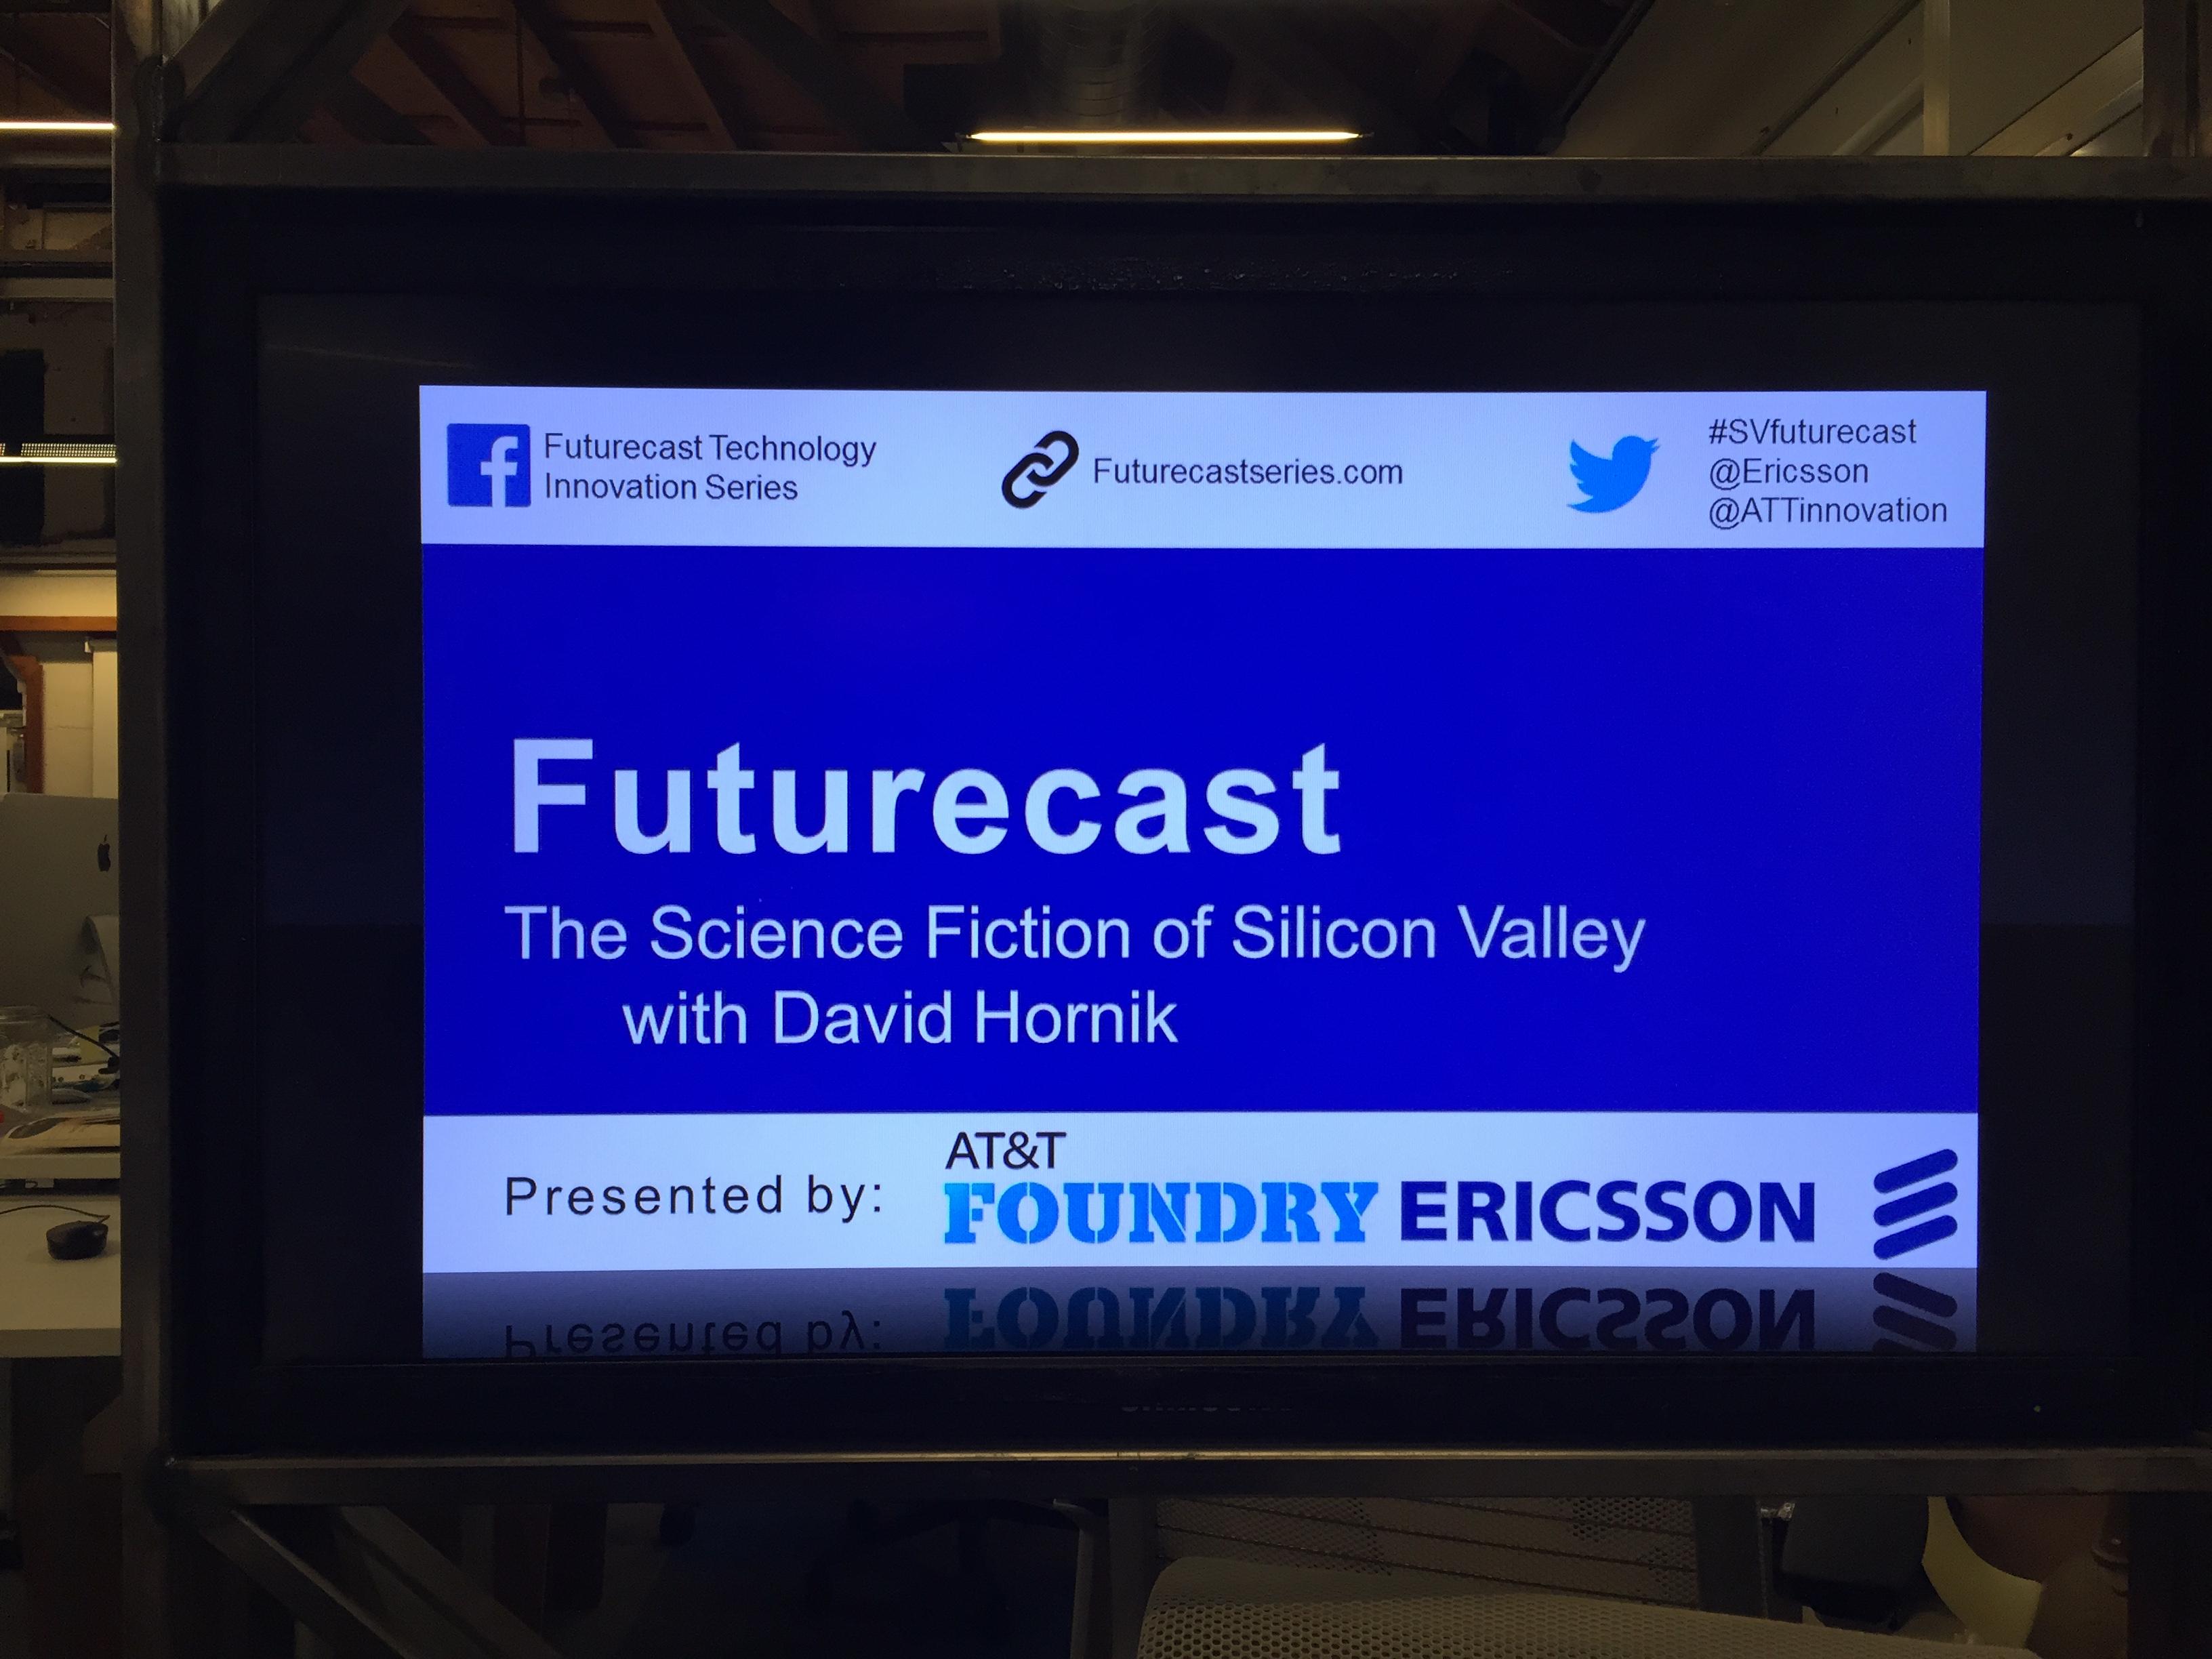 Futurecast old digital poster before rebranding